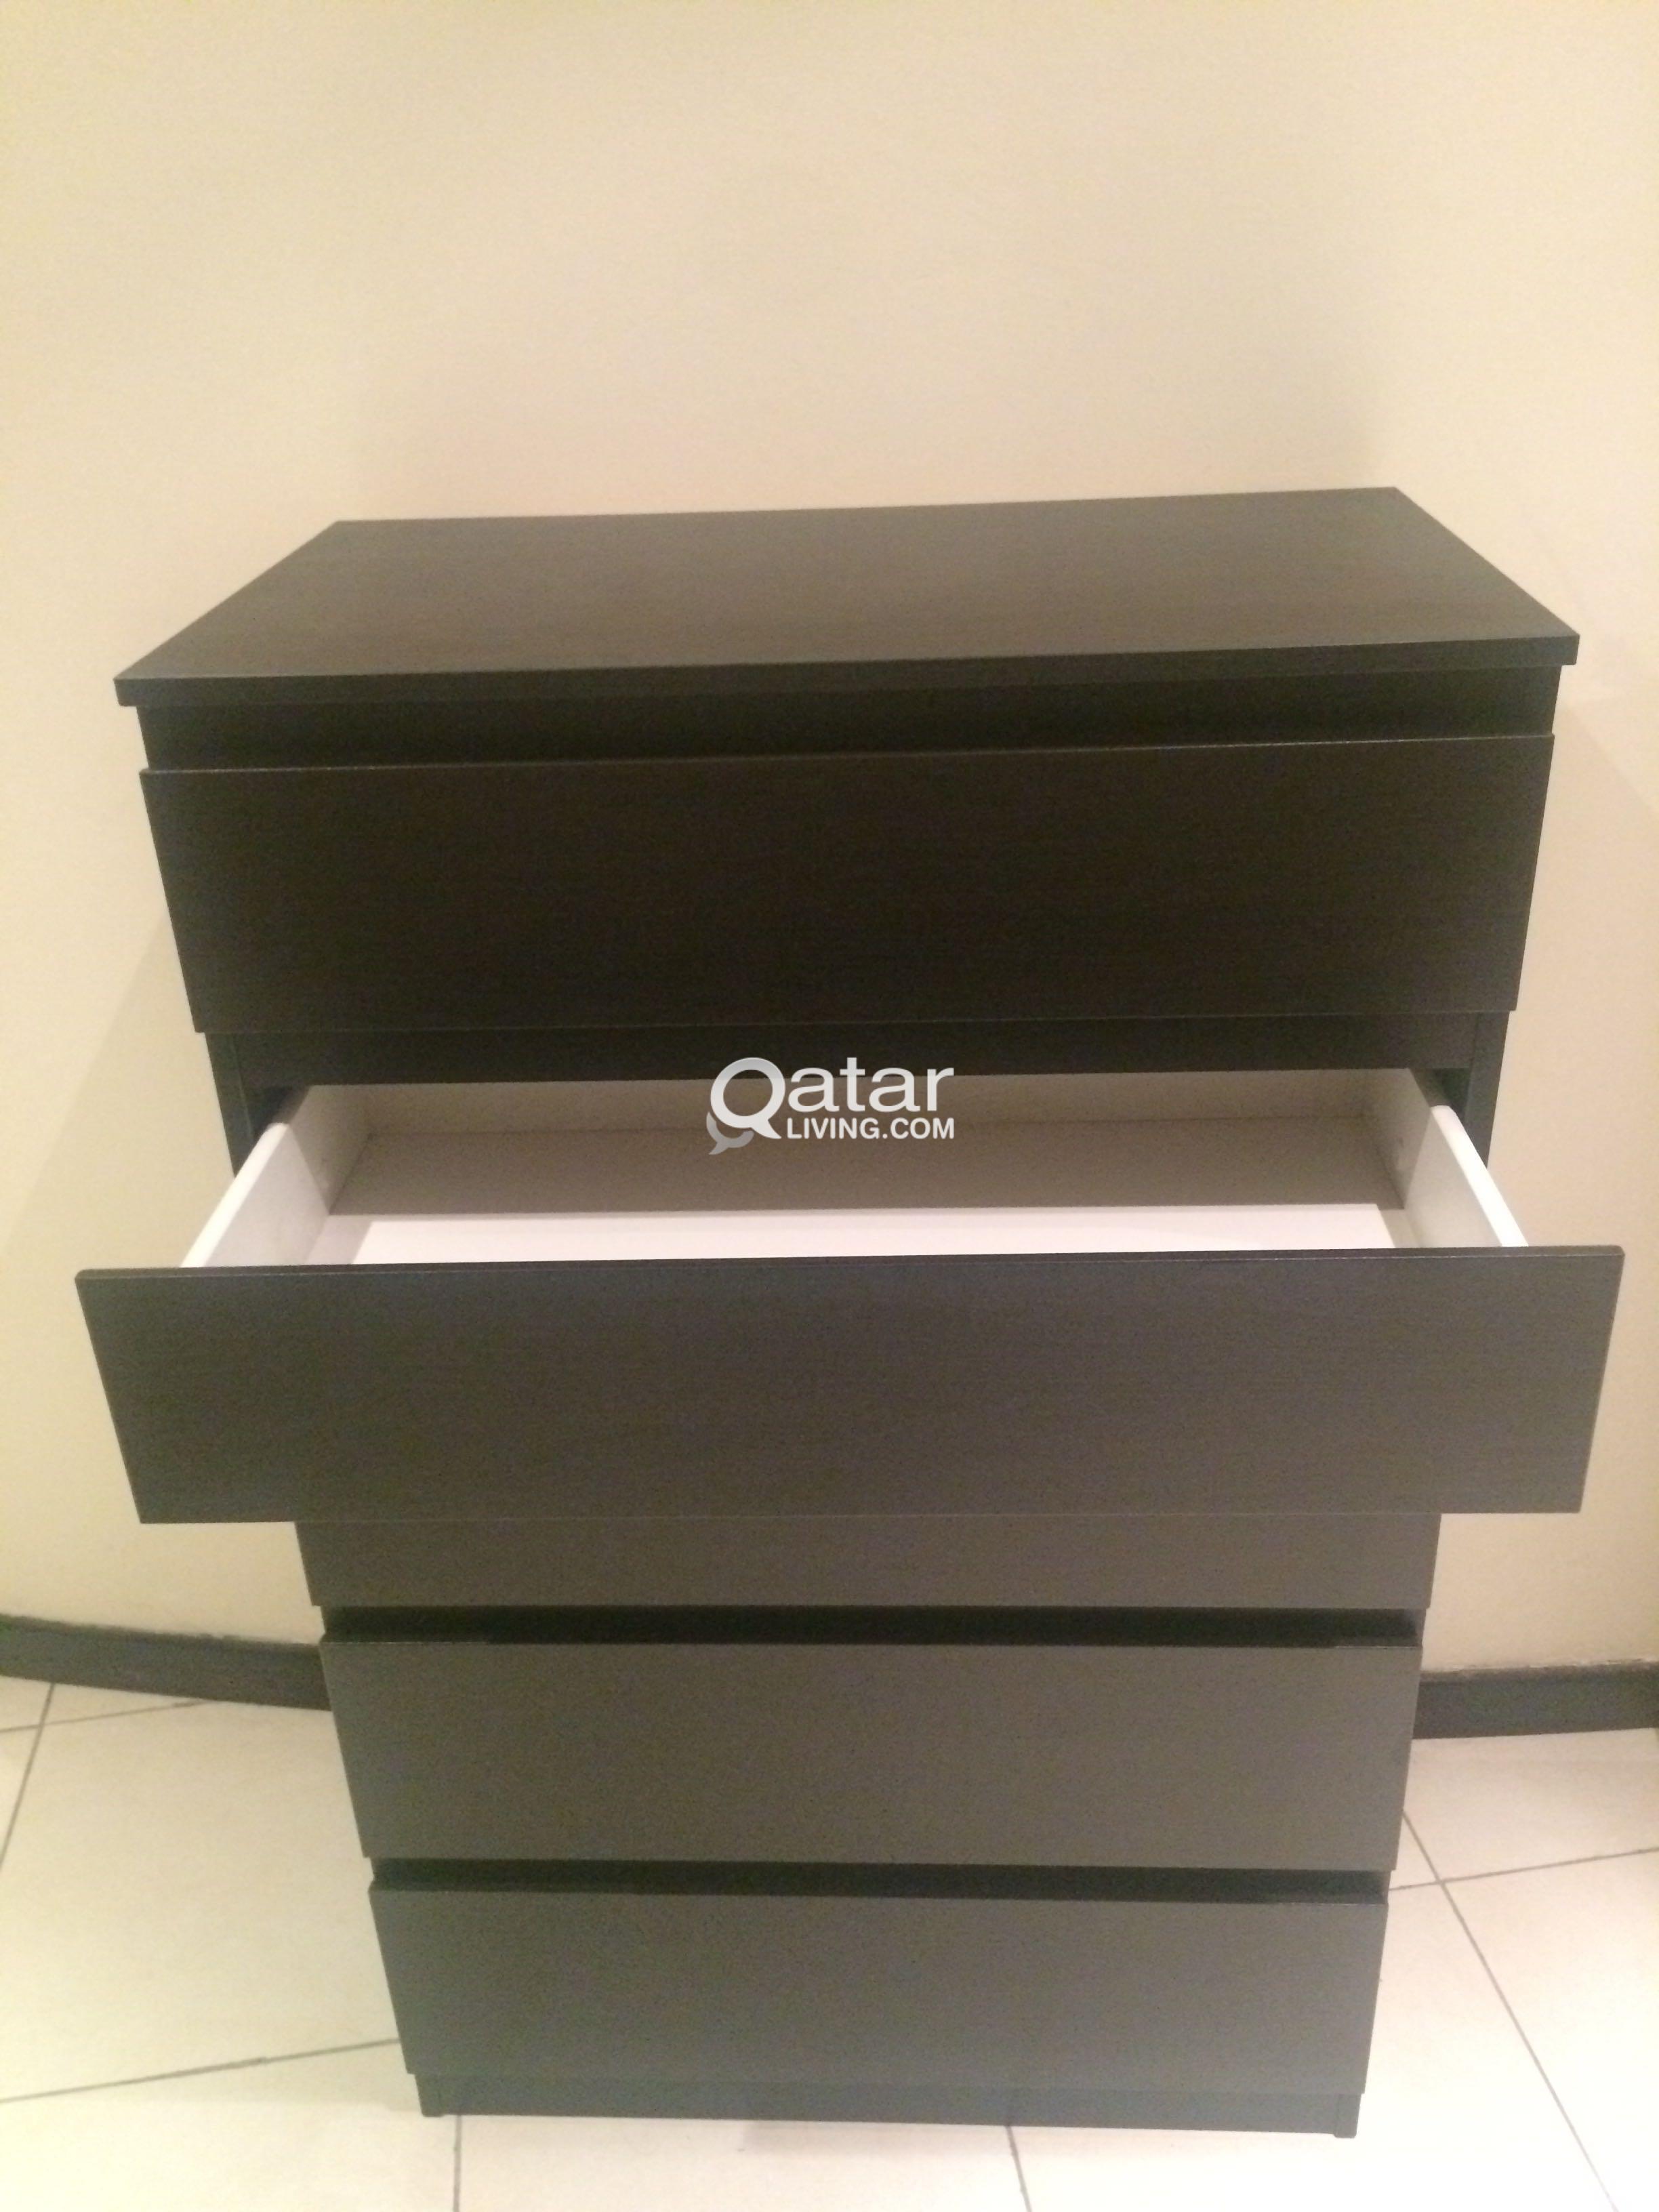 ikea kullen chest of drawers | qatar living